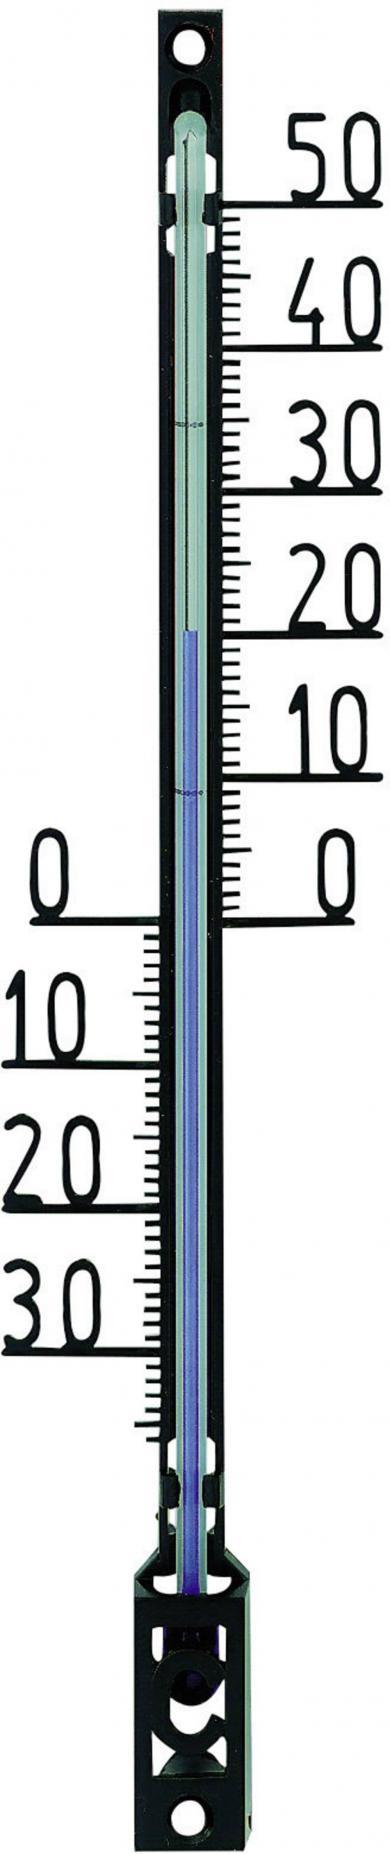 Termometru analogic de perete, negru, TFA 12.6001.01.90